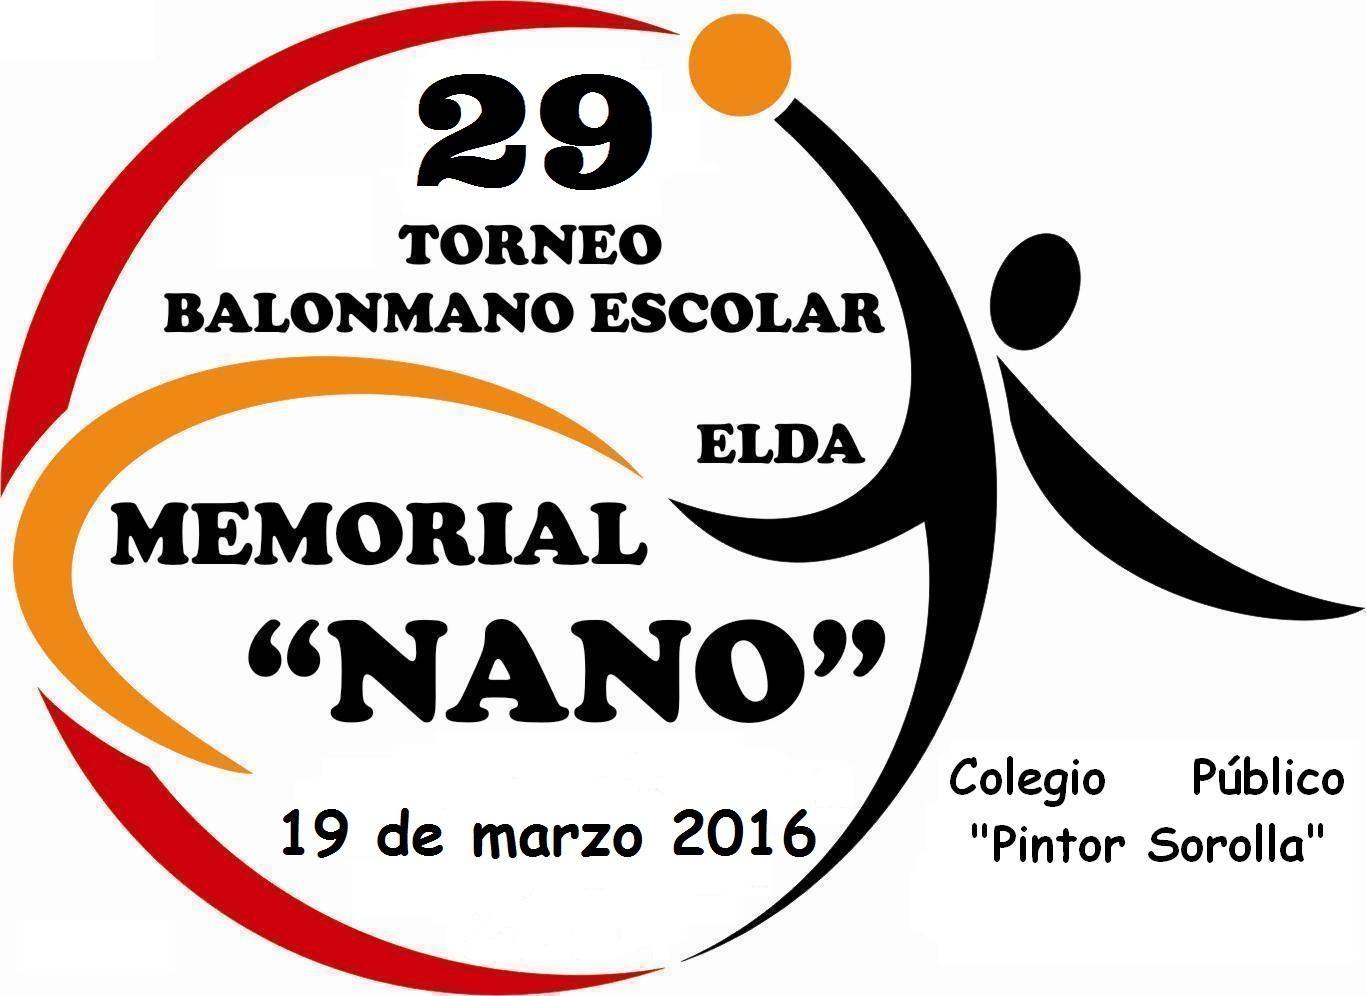 29 TORNEO MEMORIAL NANO